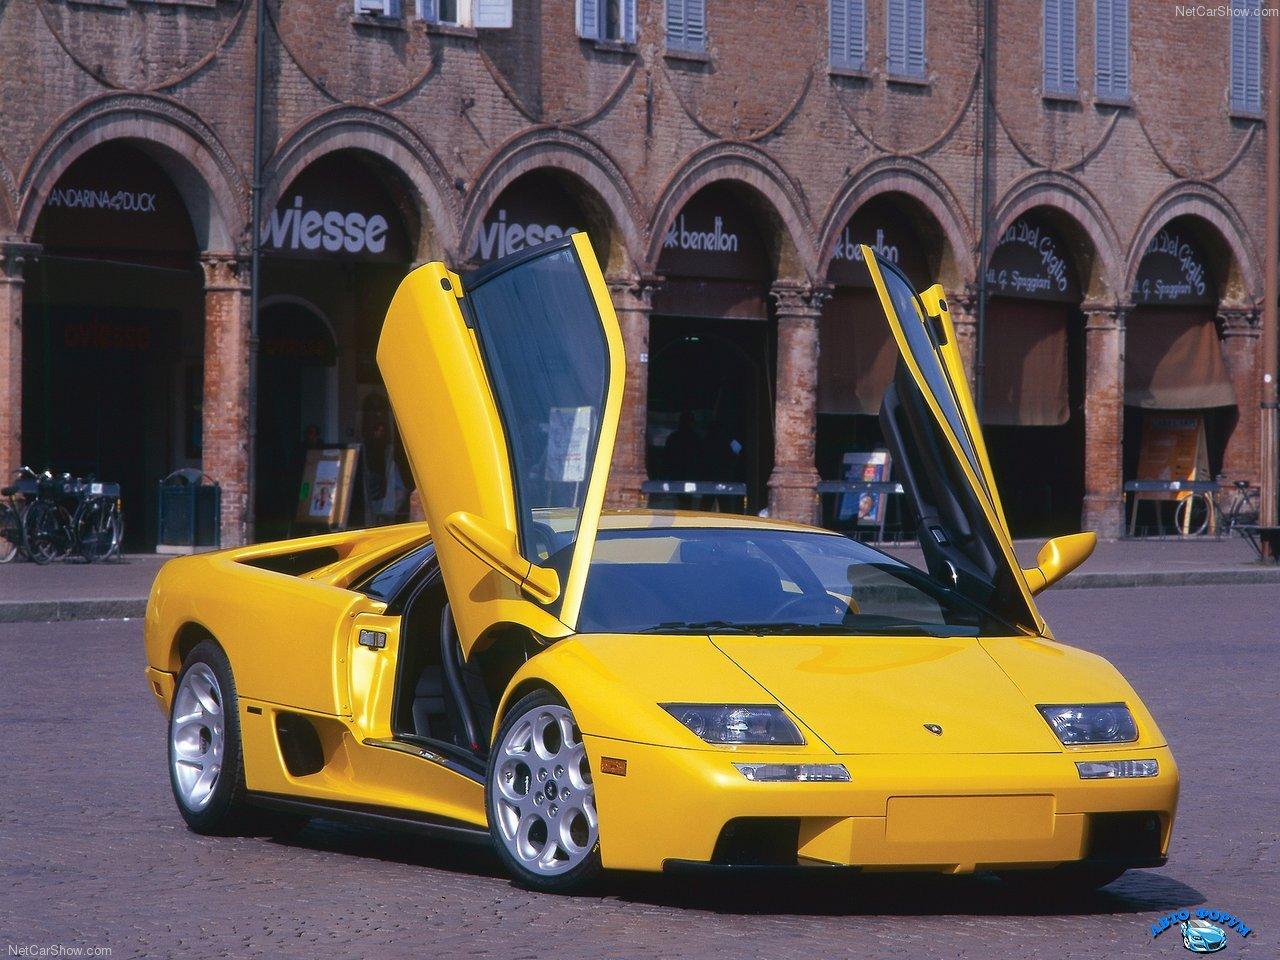 Lamborghini-Diablo_6.0_2001_1280x960_wallpaper_02.jpg